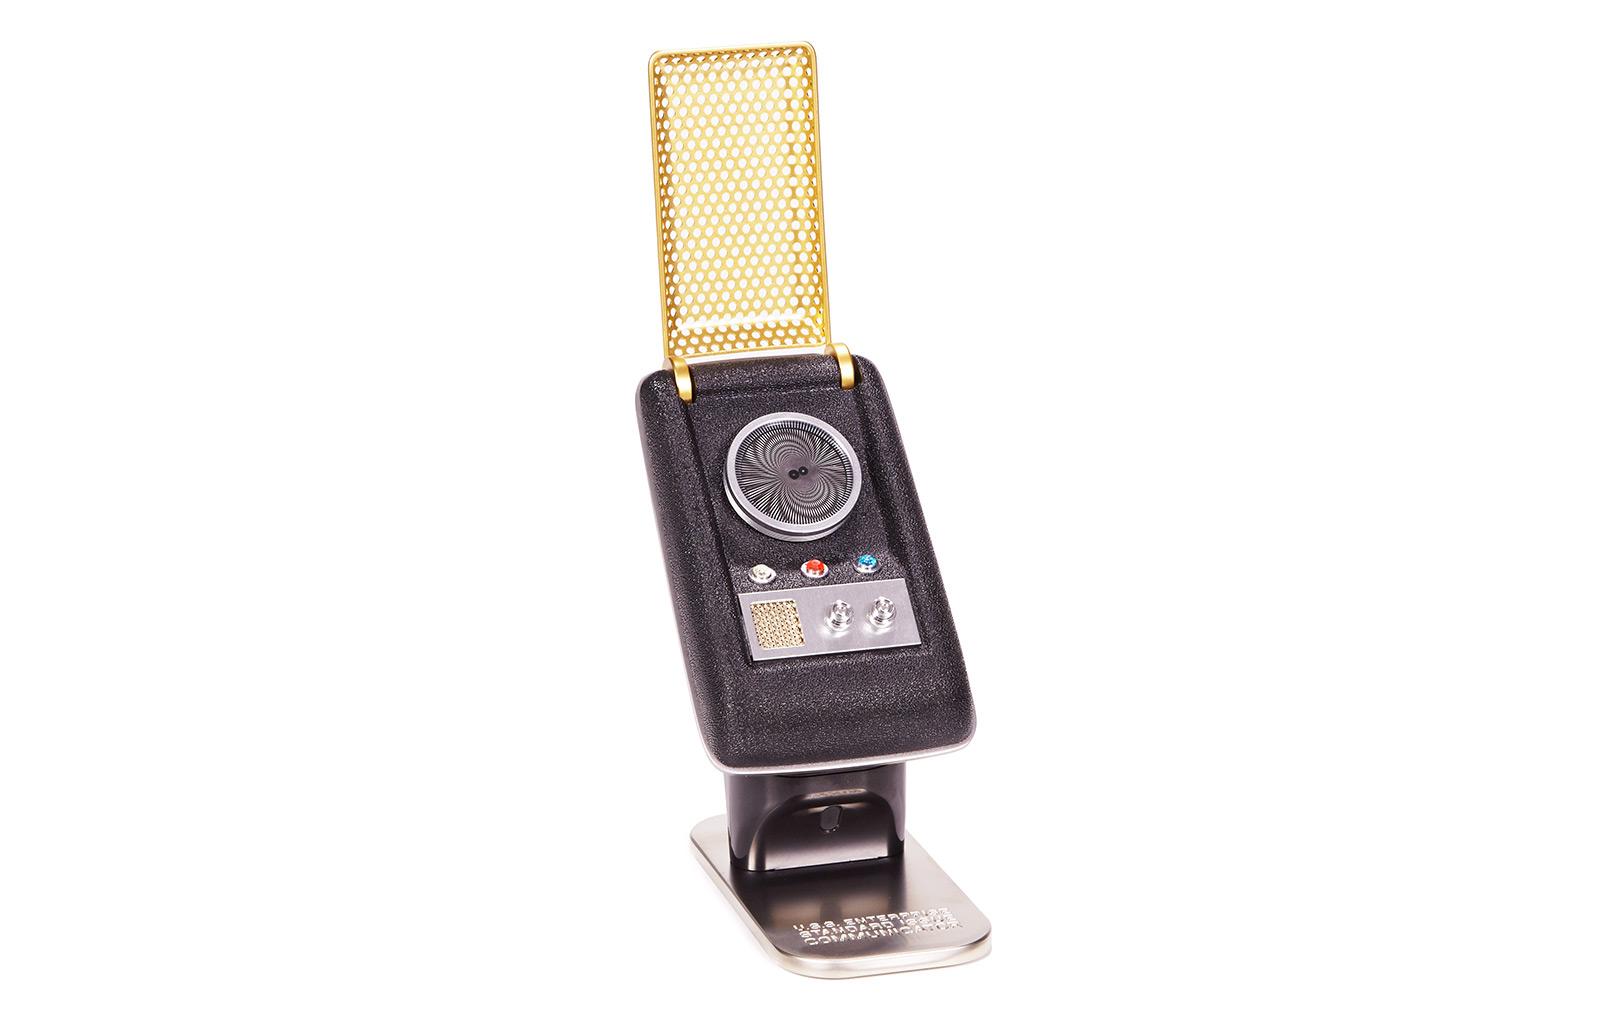 'Star Trek: The Original Series' Bluetooth Communicator